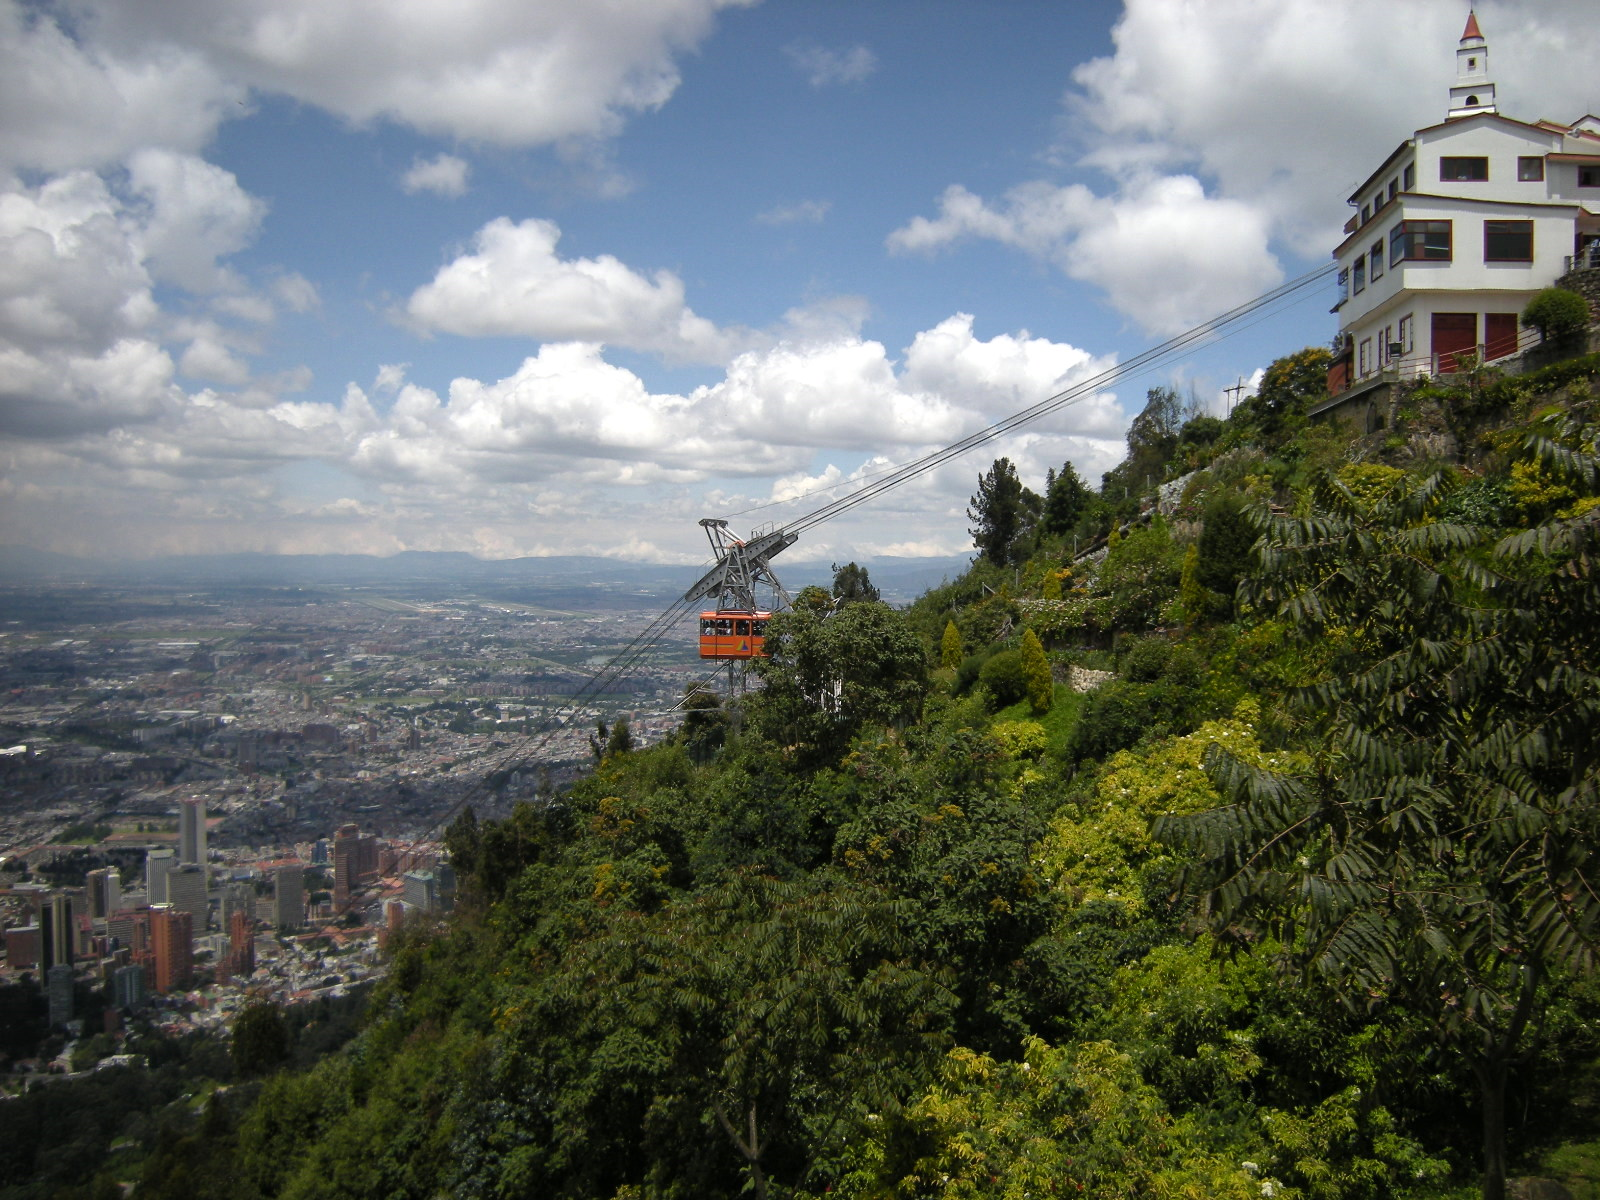 Touris activites in Bogotá